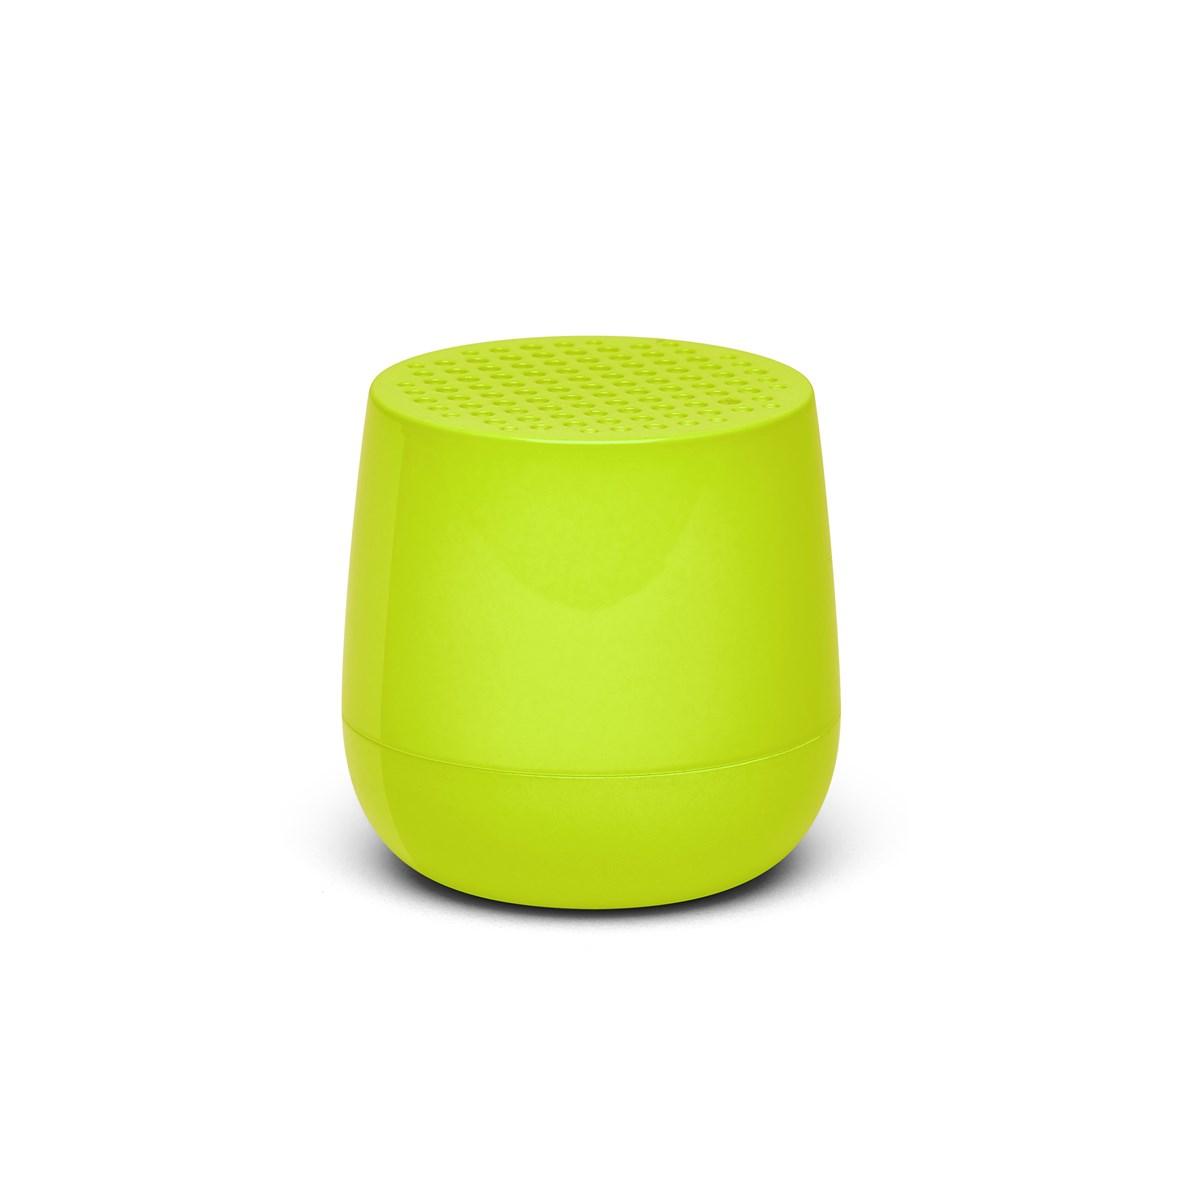 Enceinte bluetooth 3W rechargeable en ABS jaune